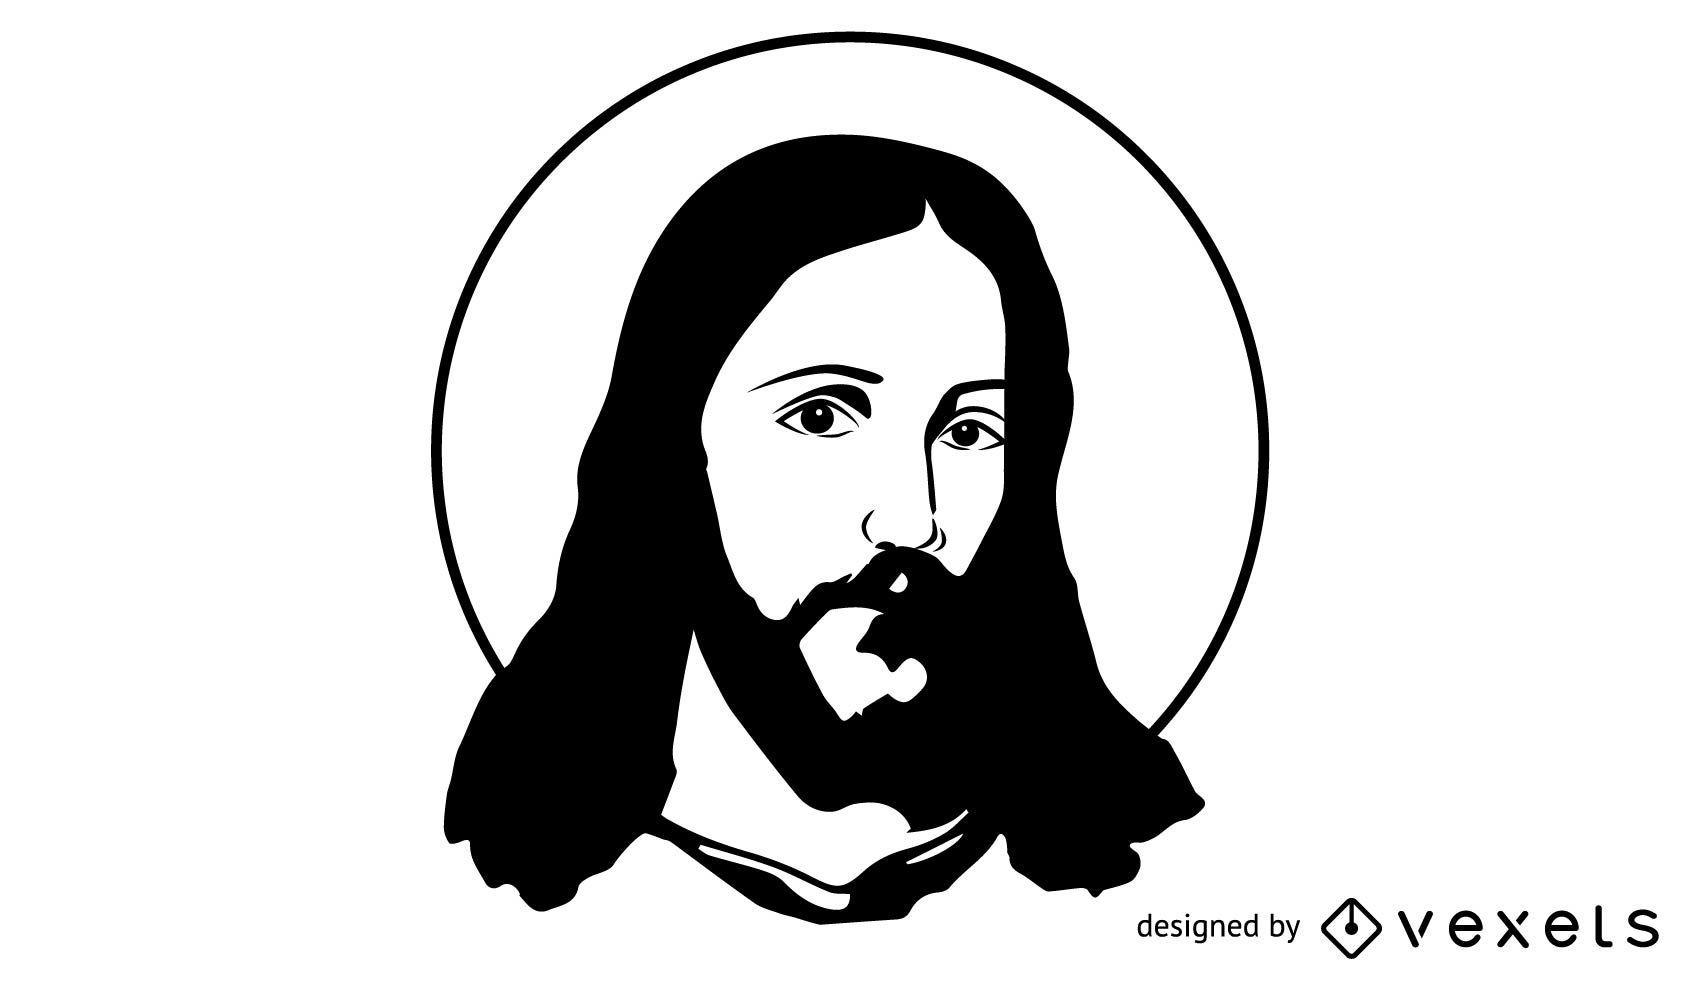 Black & White Artistic Jesus Christ